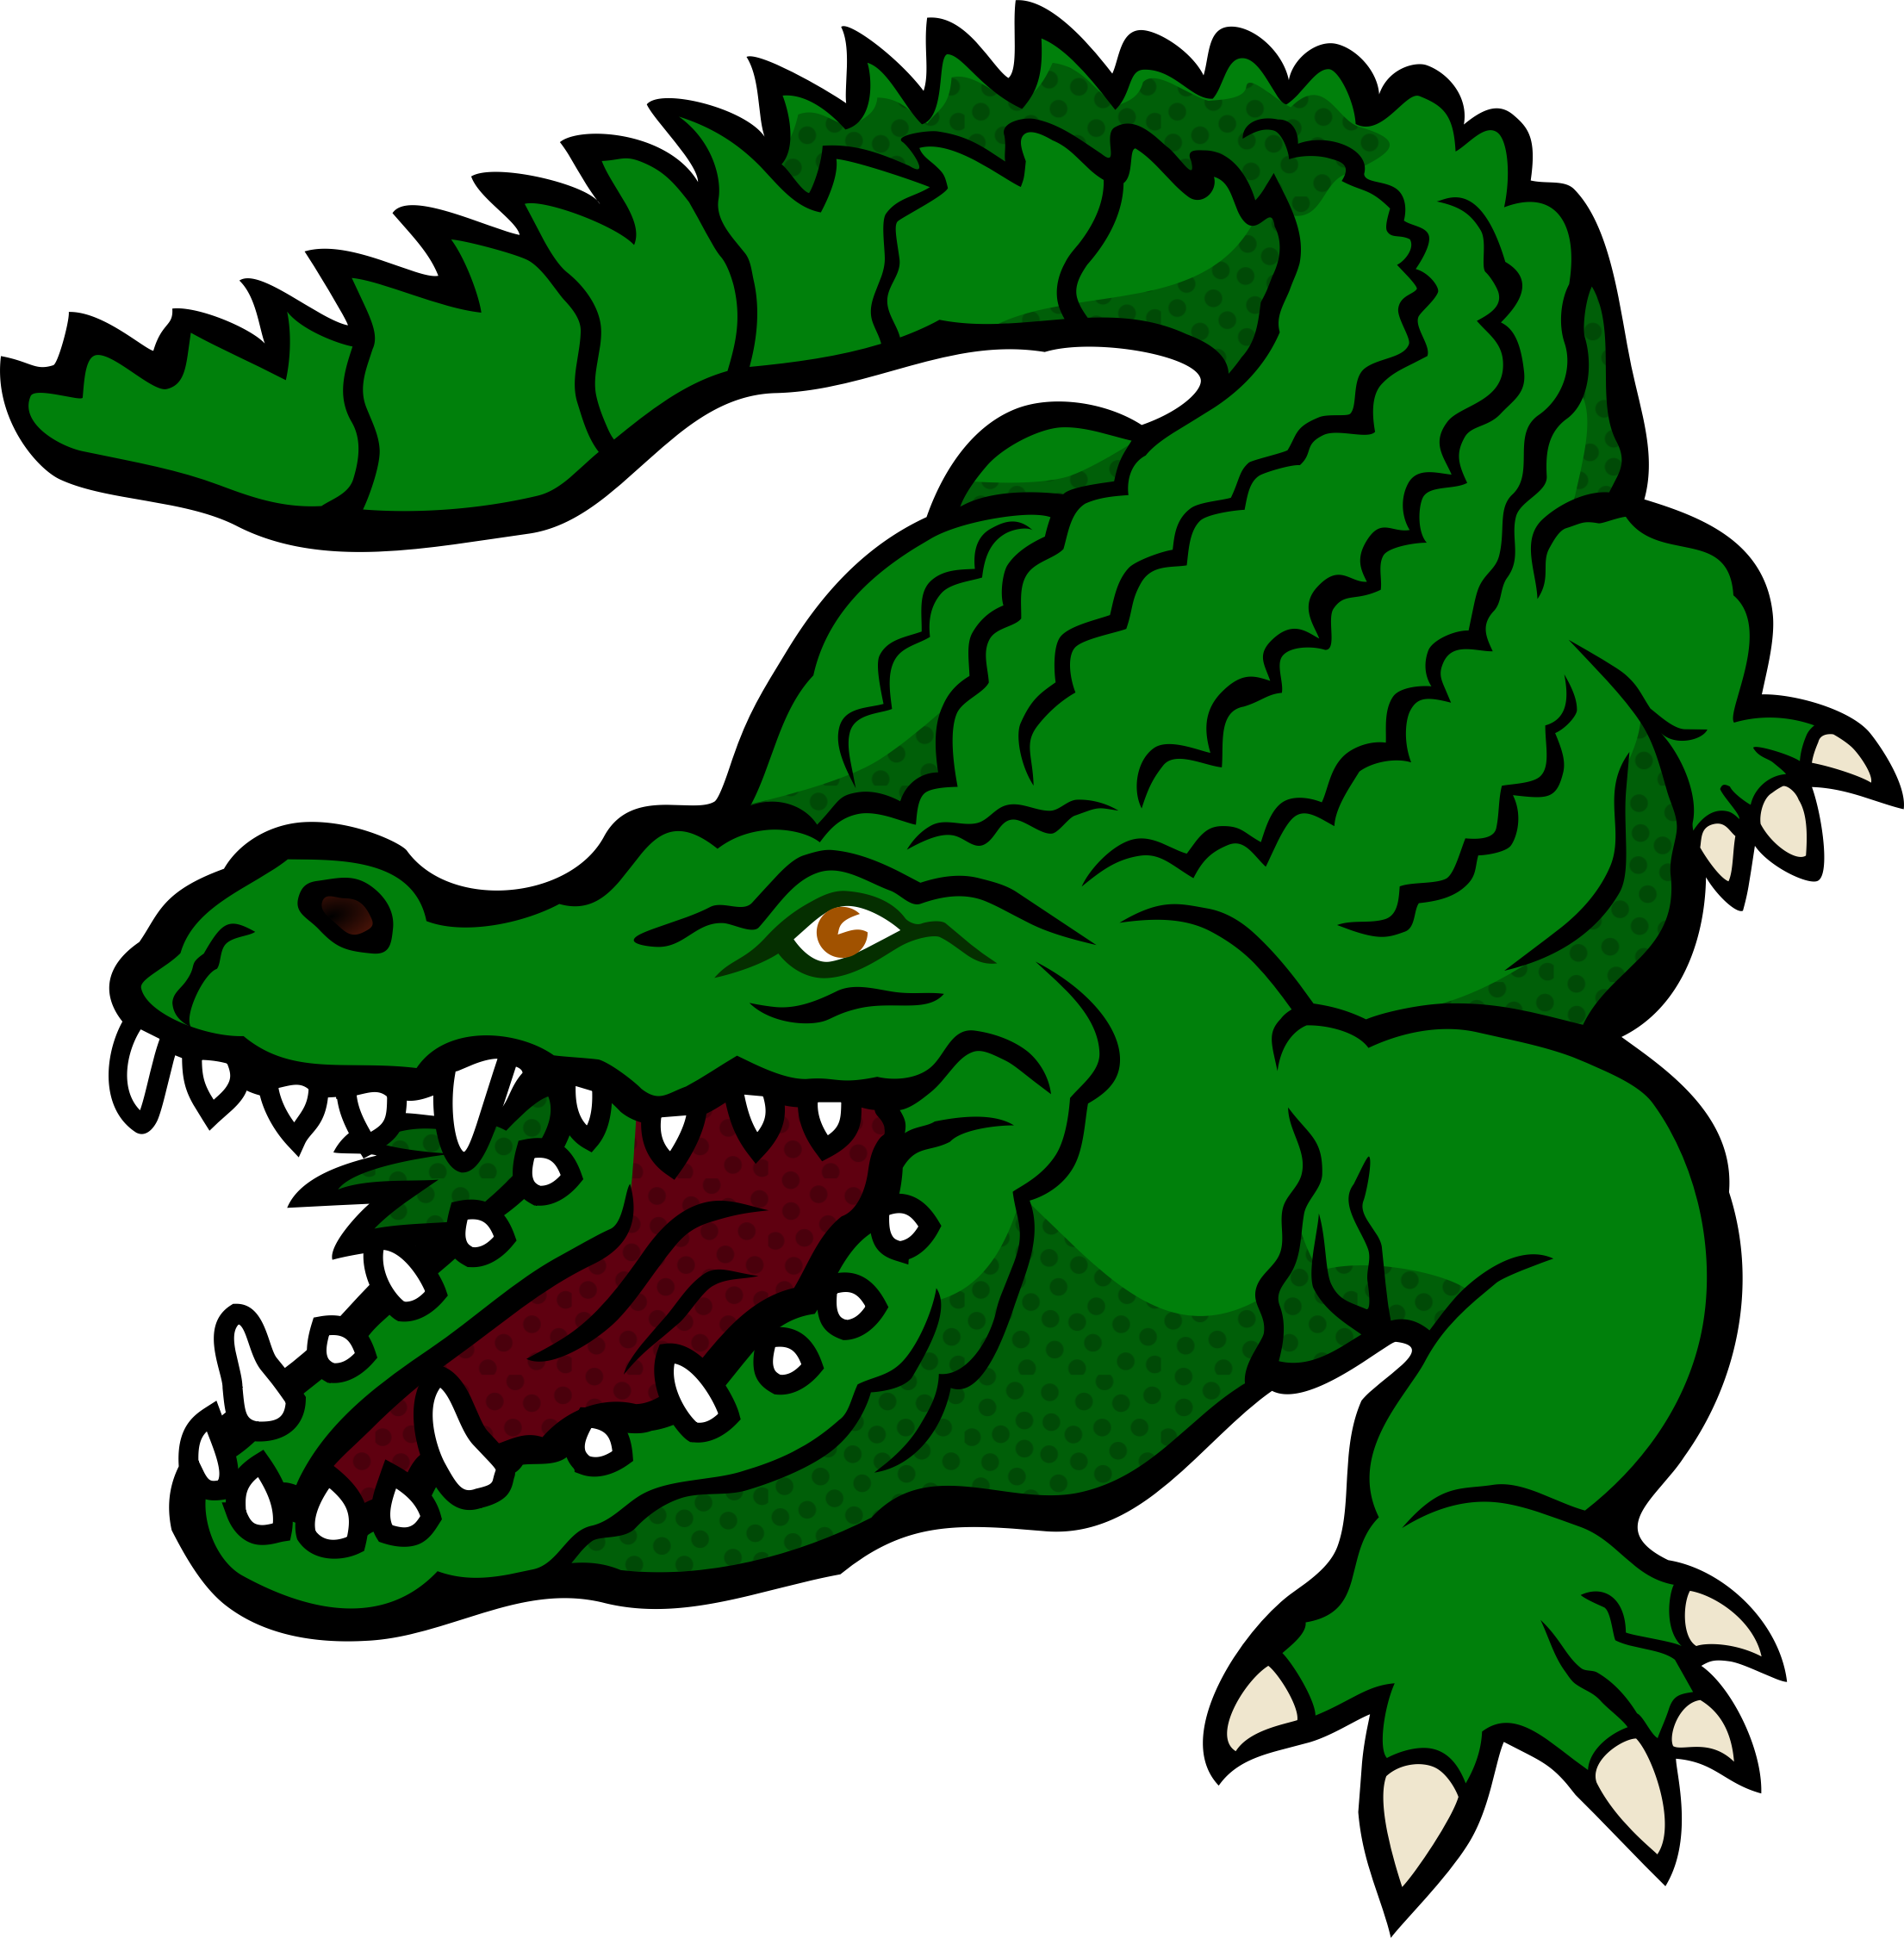 Coloring clipart crocodile. Coloured swim team pinterest